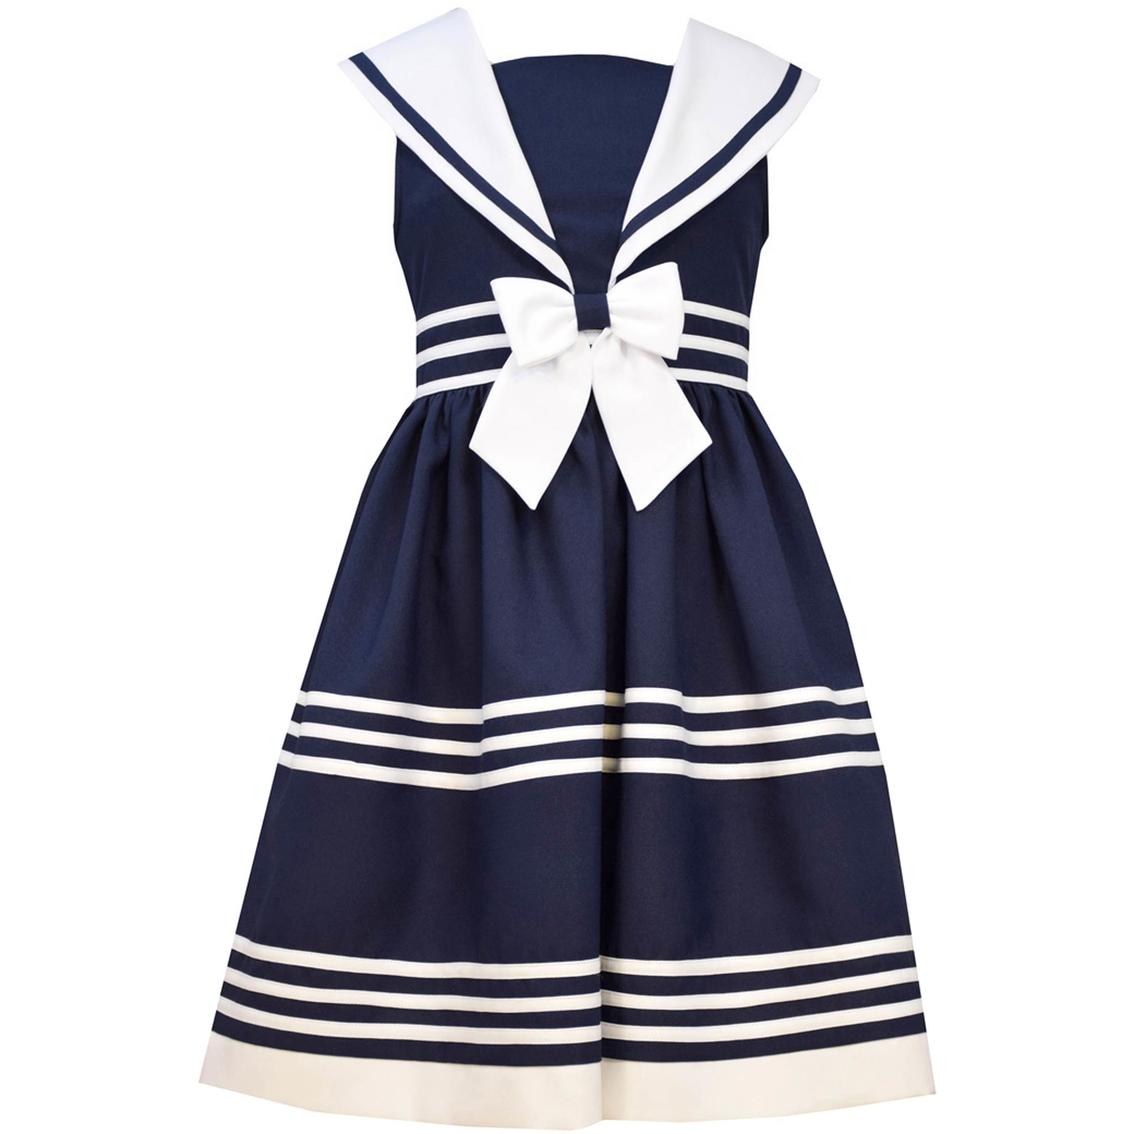 2e3d5ad9c15 Bonnie Jean Toddler Girls Traditional Sleeveless Nautical Dress ...